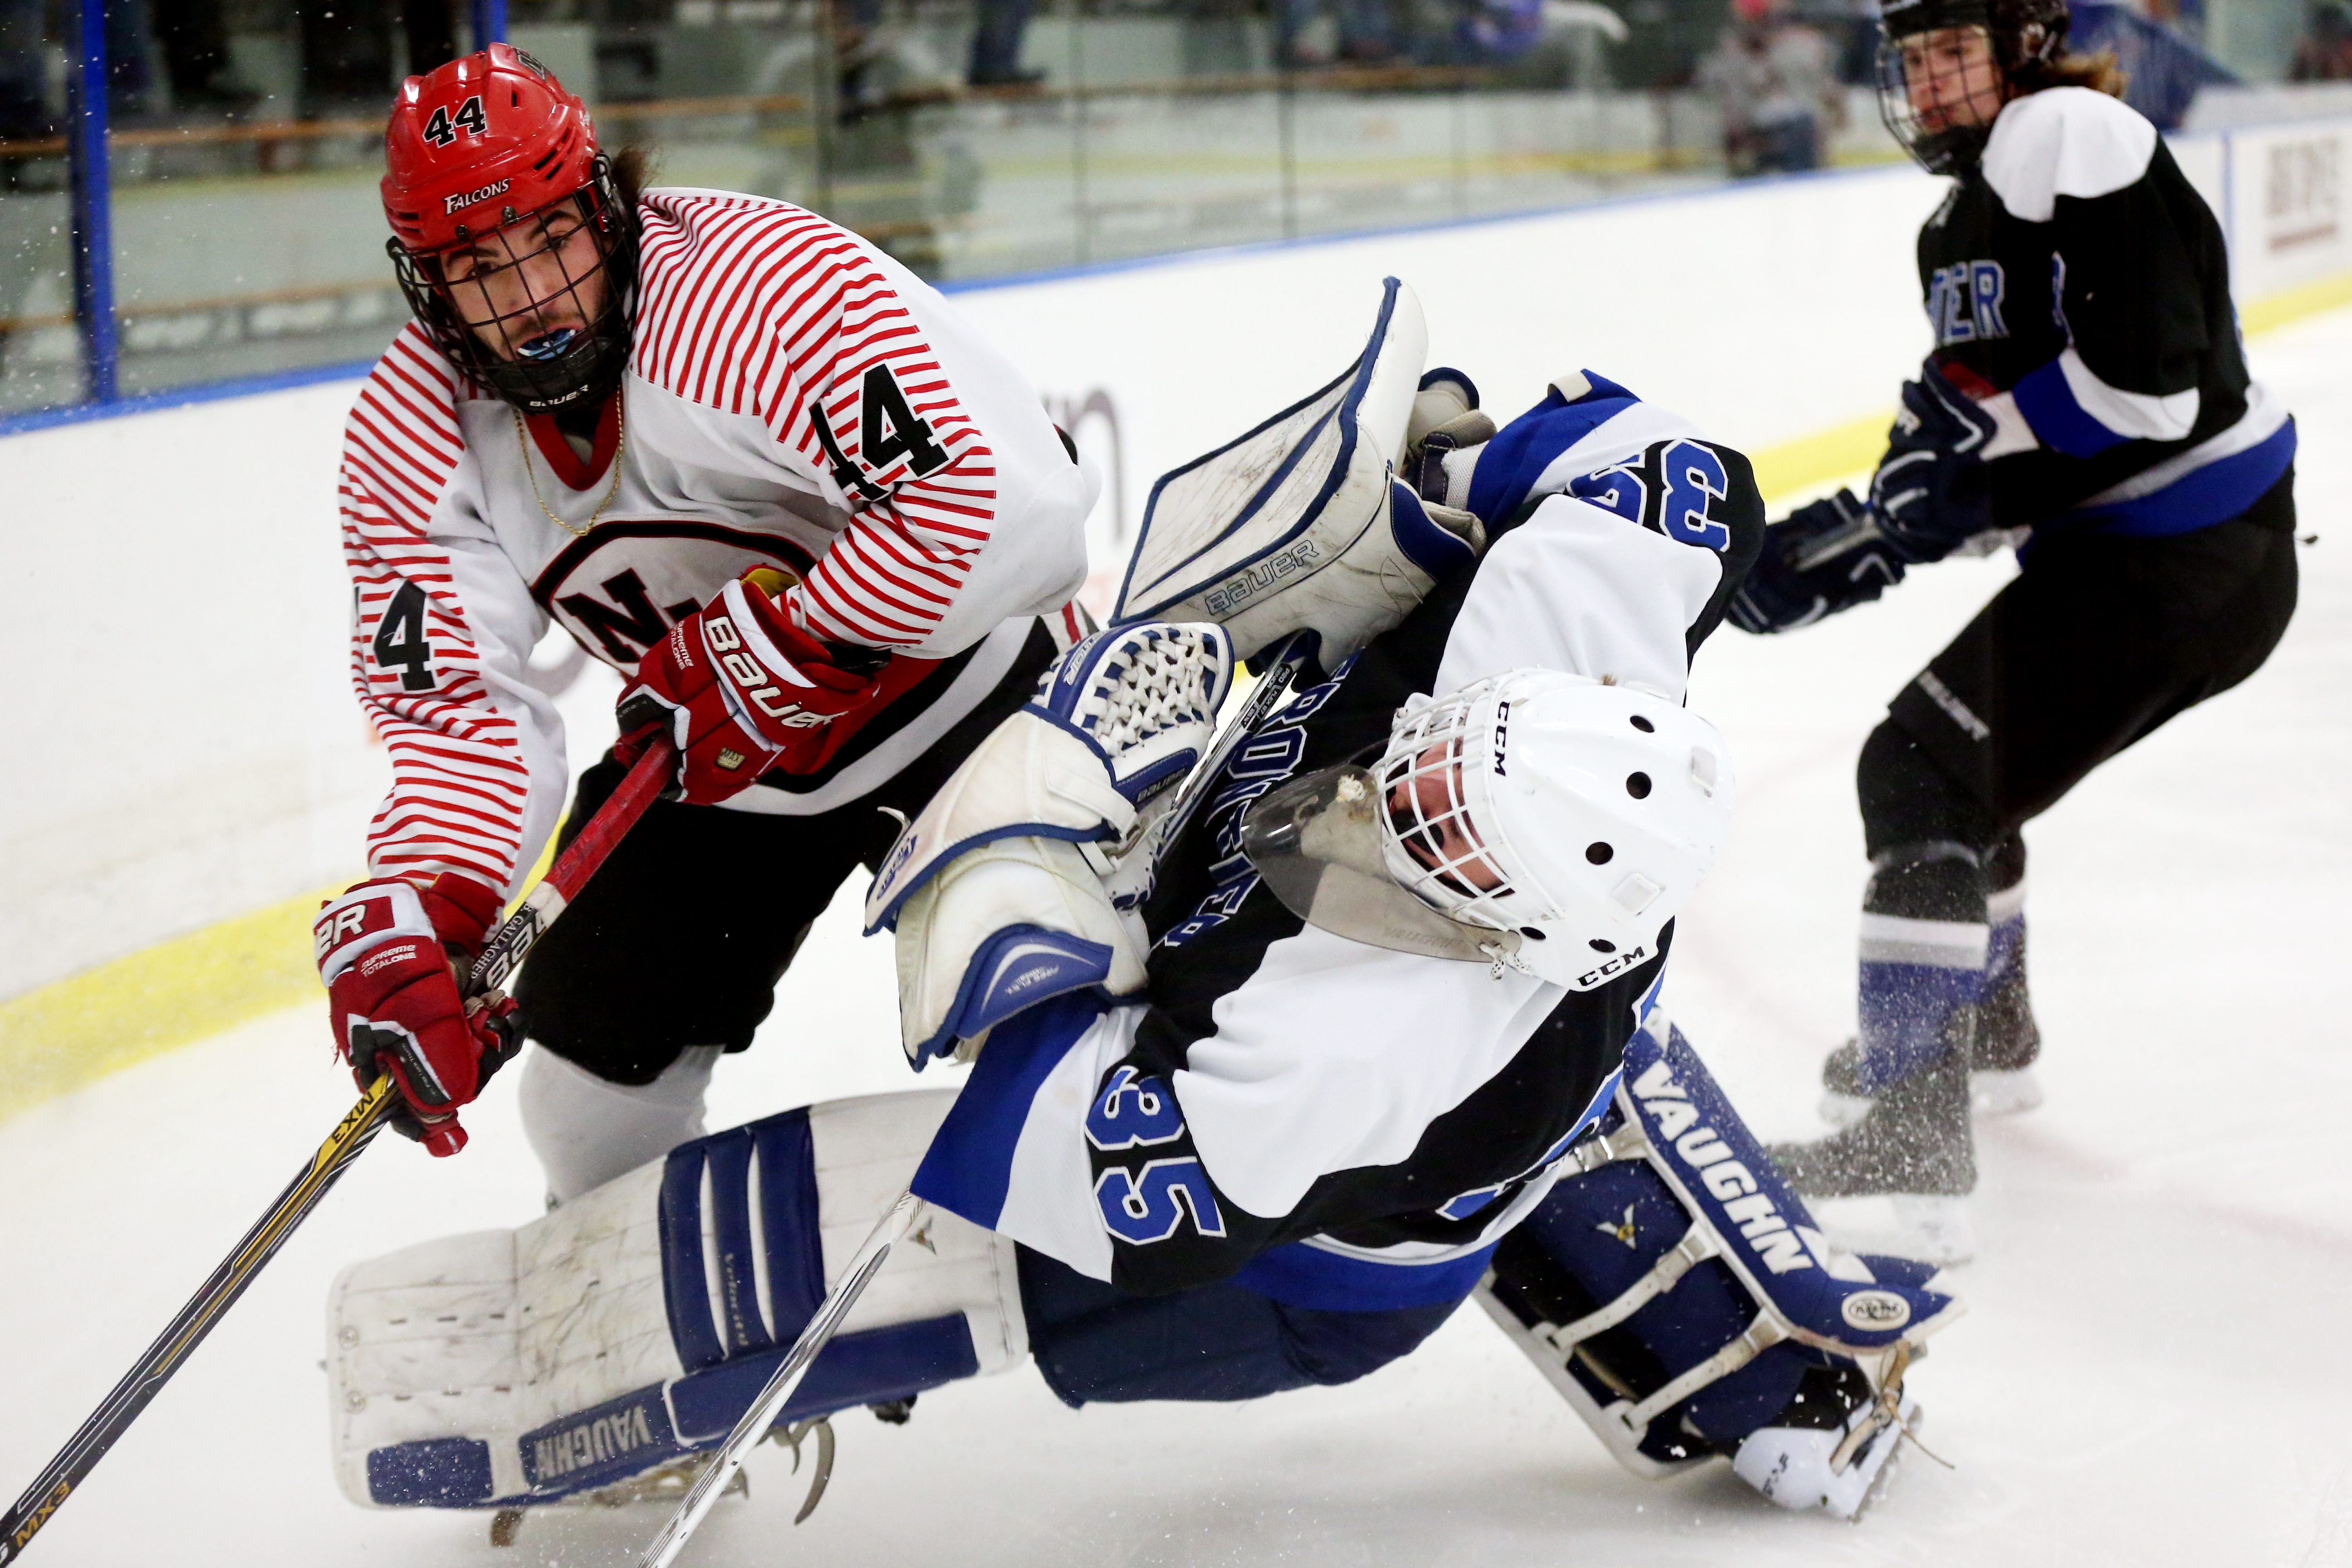 Niagara Wheatfield's Alex Bauer received a penalty for plowing into Frontier goalie Ryan Kaska.